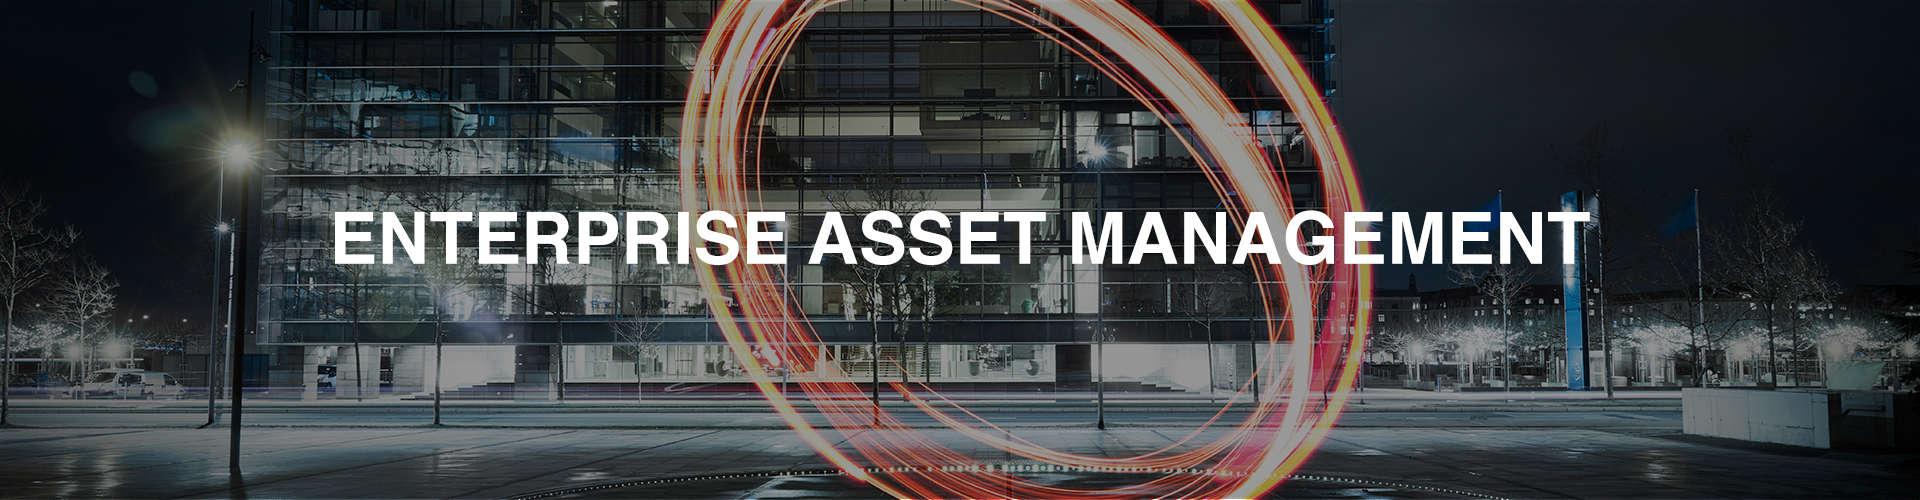 Enteprise Asset Management (APM)